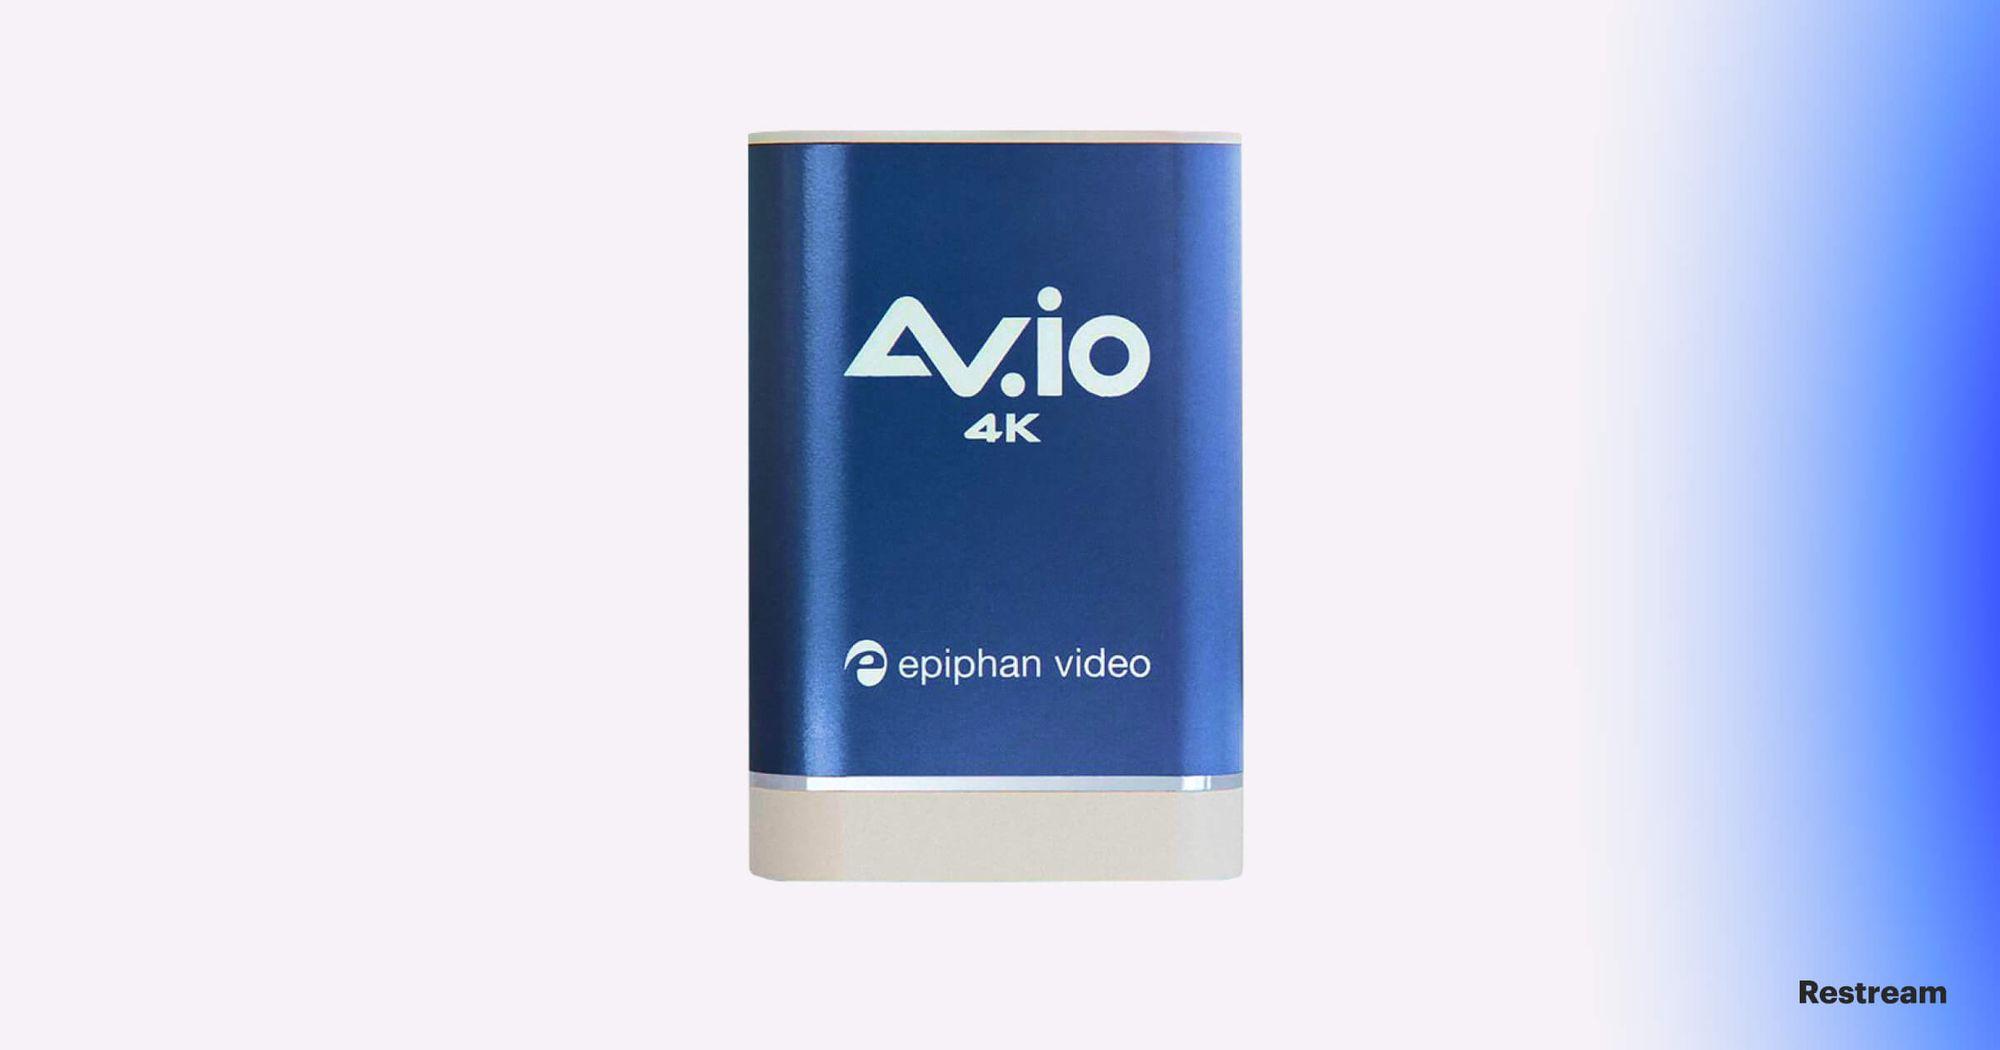 Epiphan Systems Inc. AV.io 4K